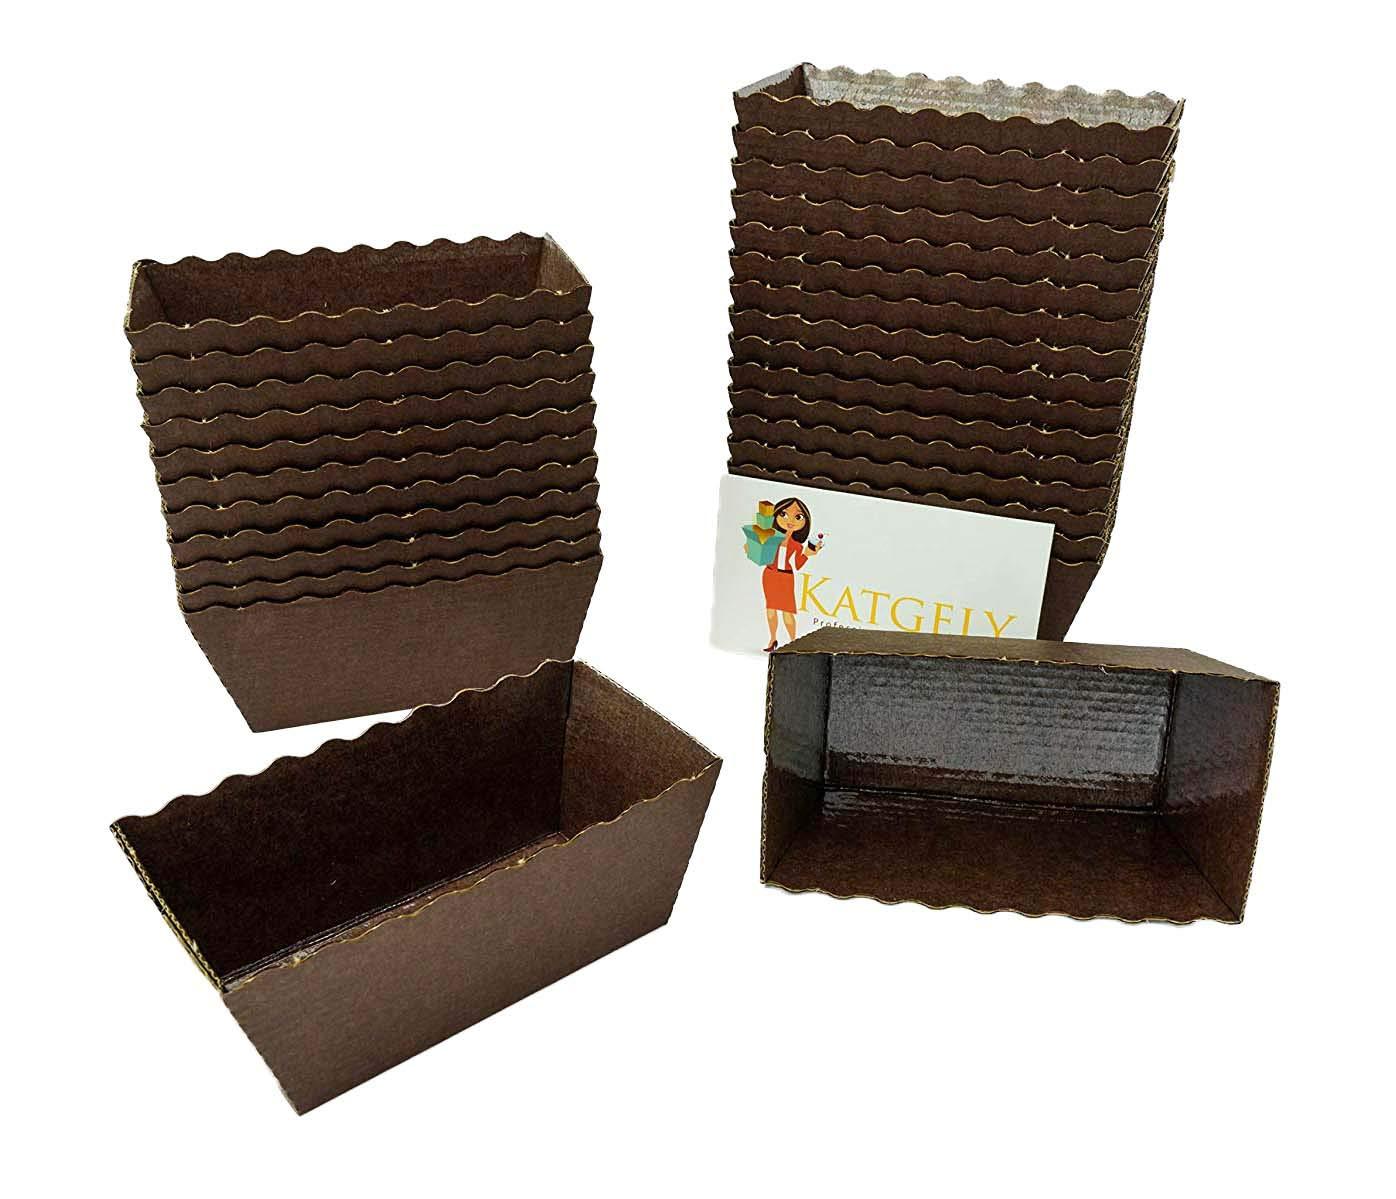 Katgely Dark Brown Mini Loaf Mold (Pack of 100) by katgely